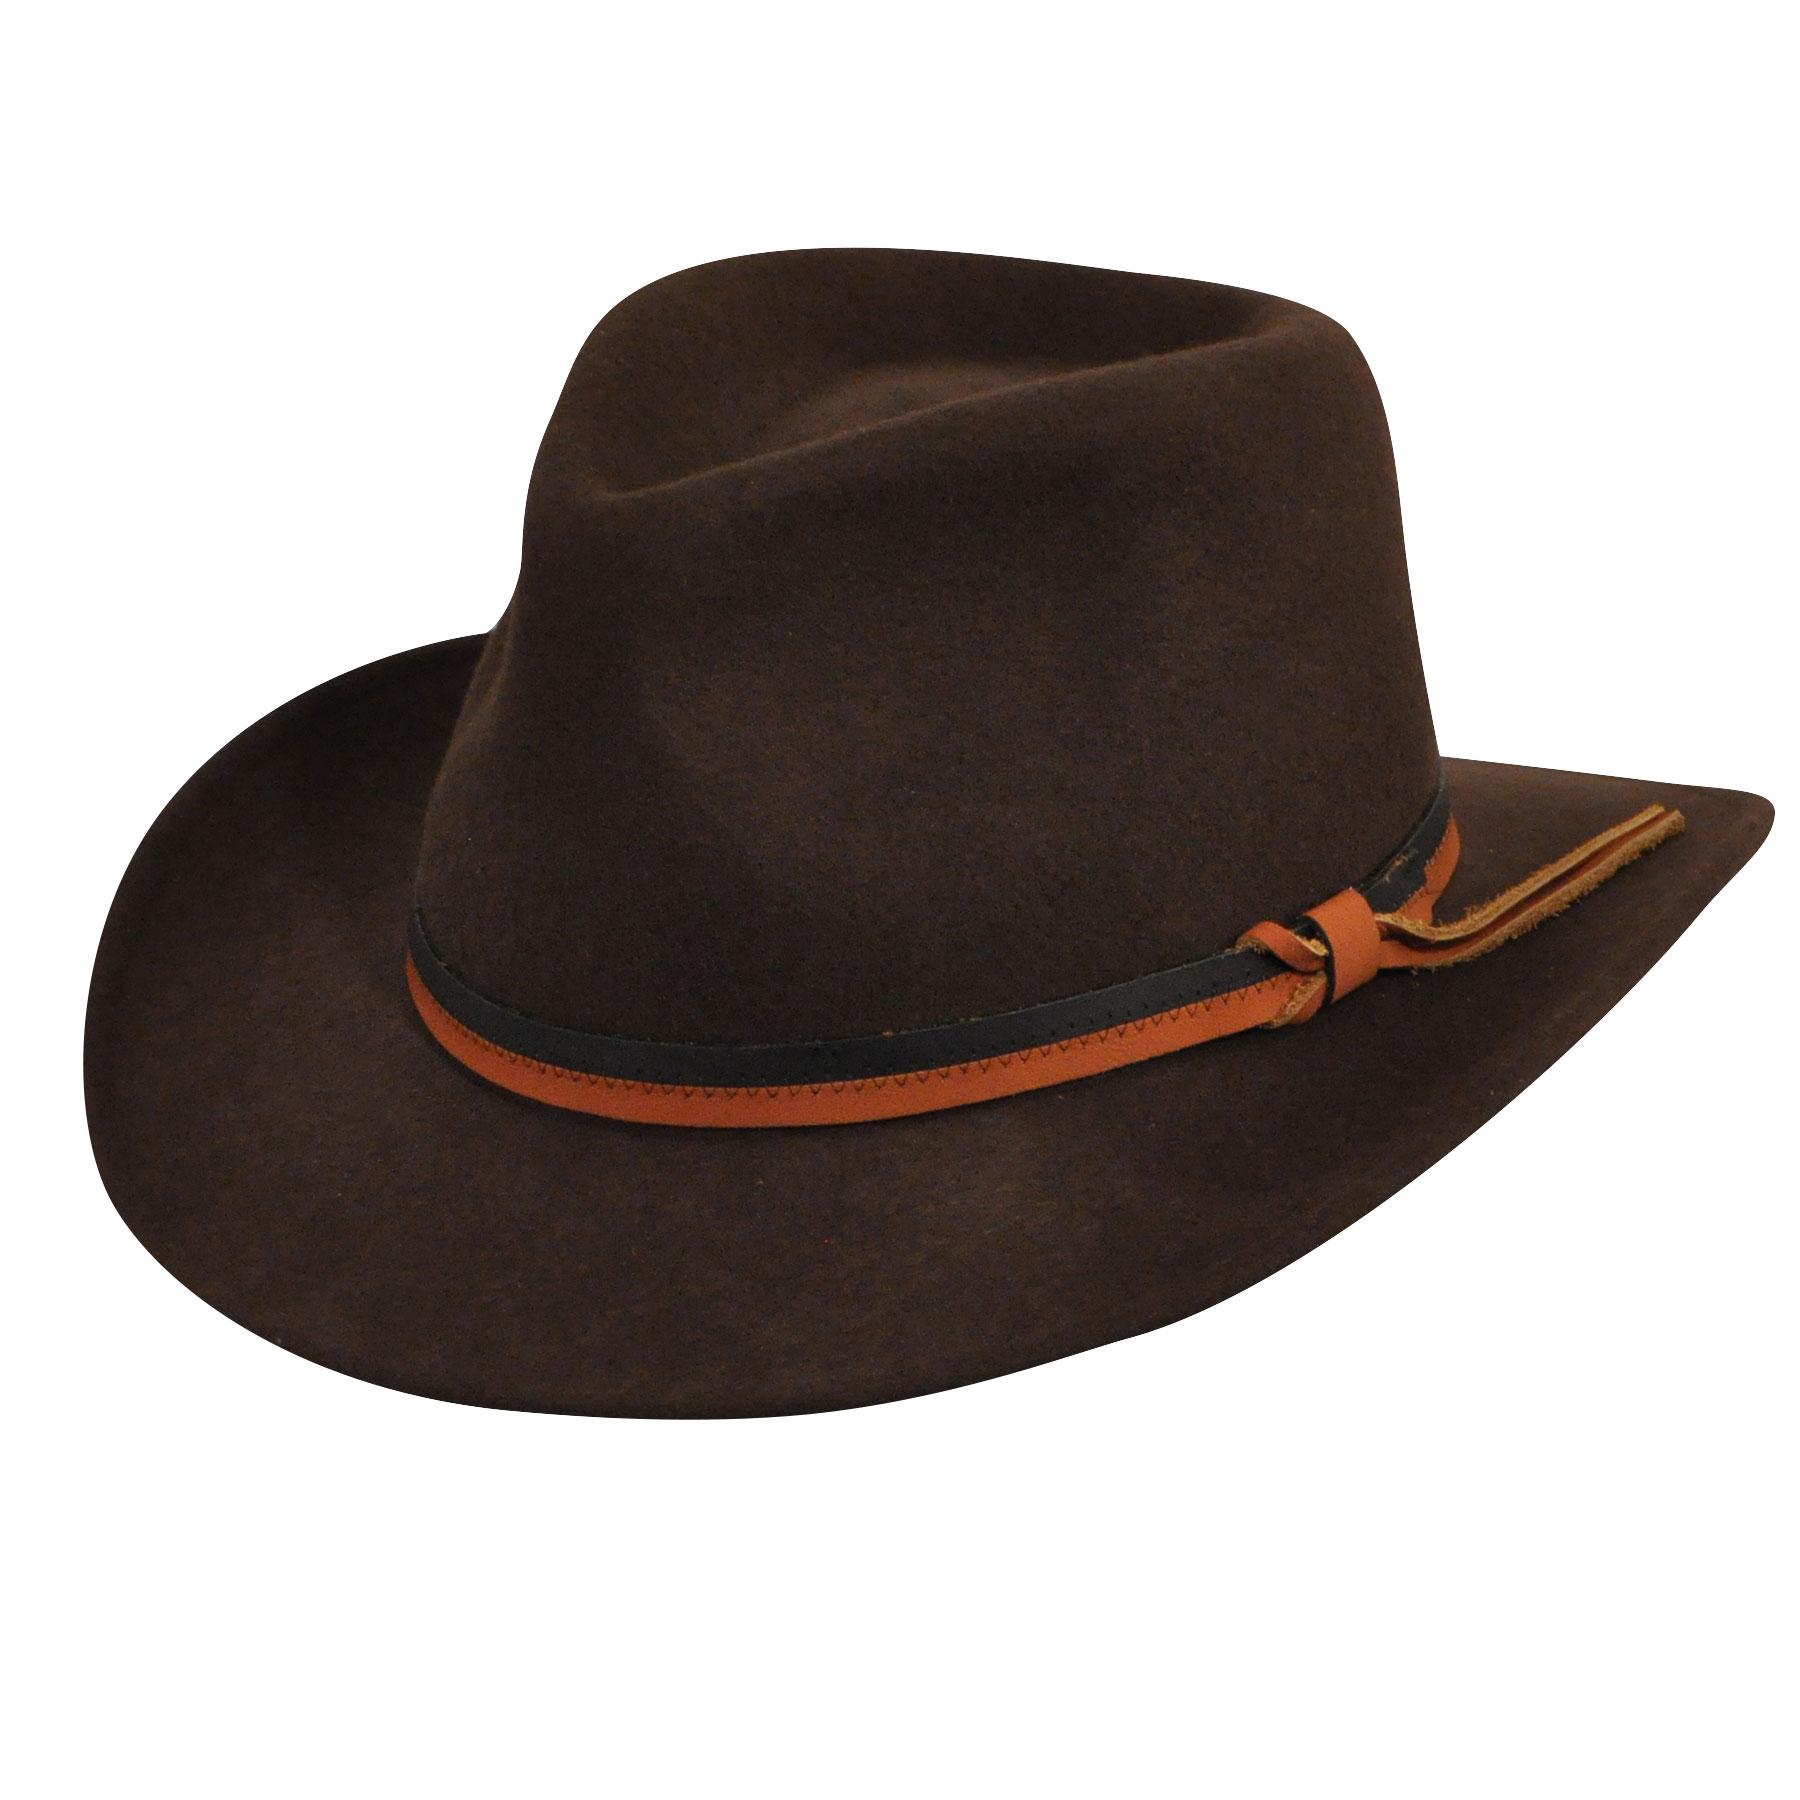 Country Gentleman Felt Outback Hat in Dark Olive